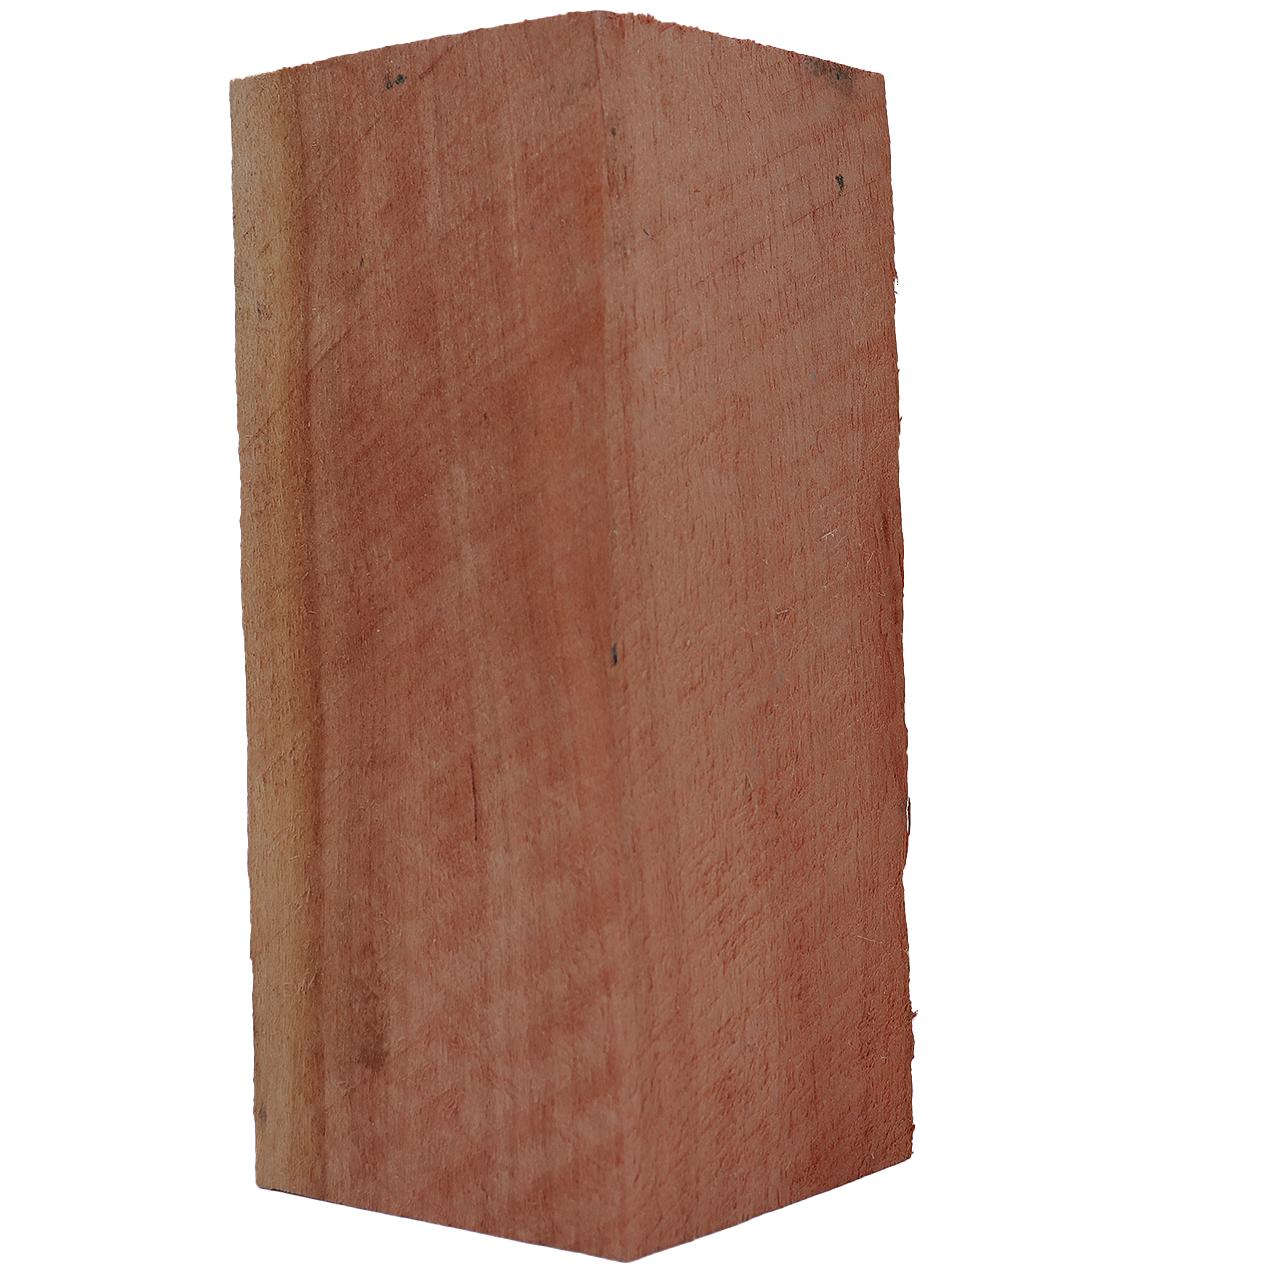 Solid Cherry Turning Blank, 3x 3x 8 Inch